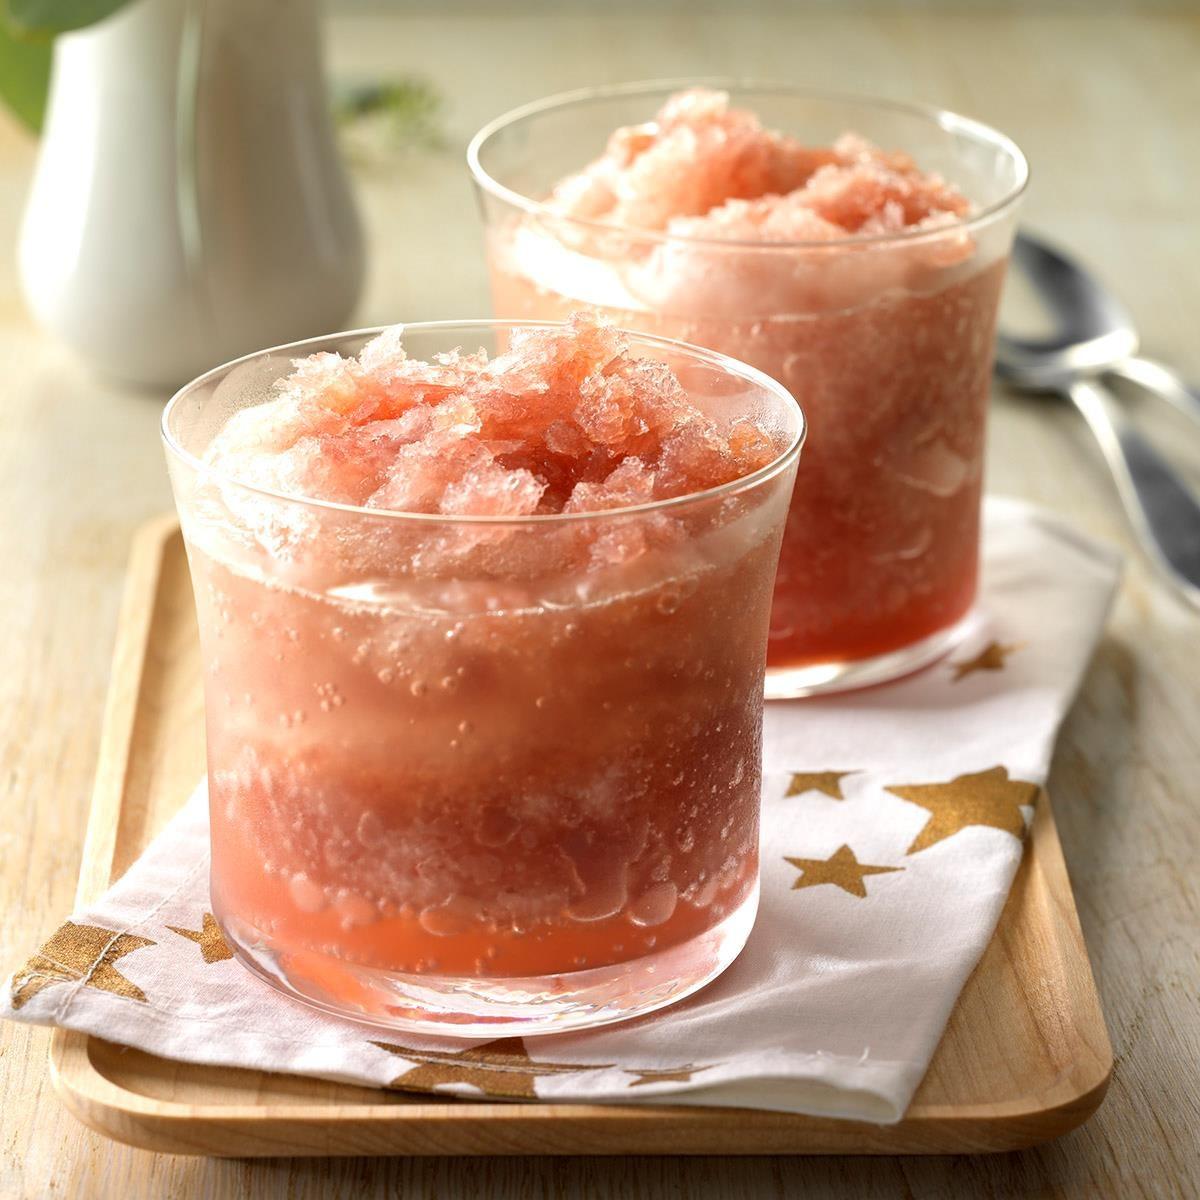 Cranberry-Orange Vodka Slush